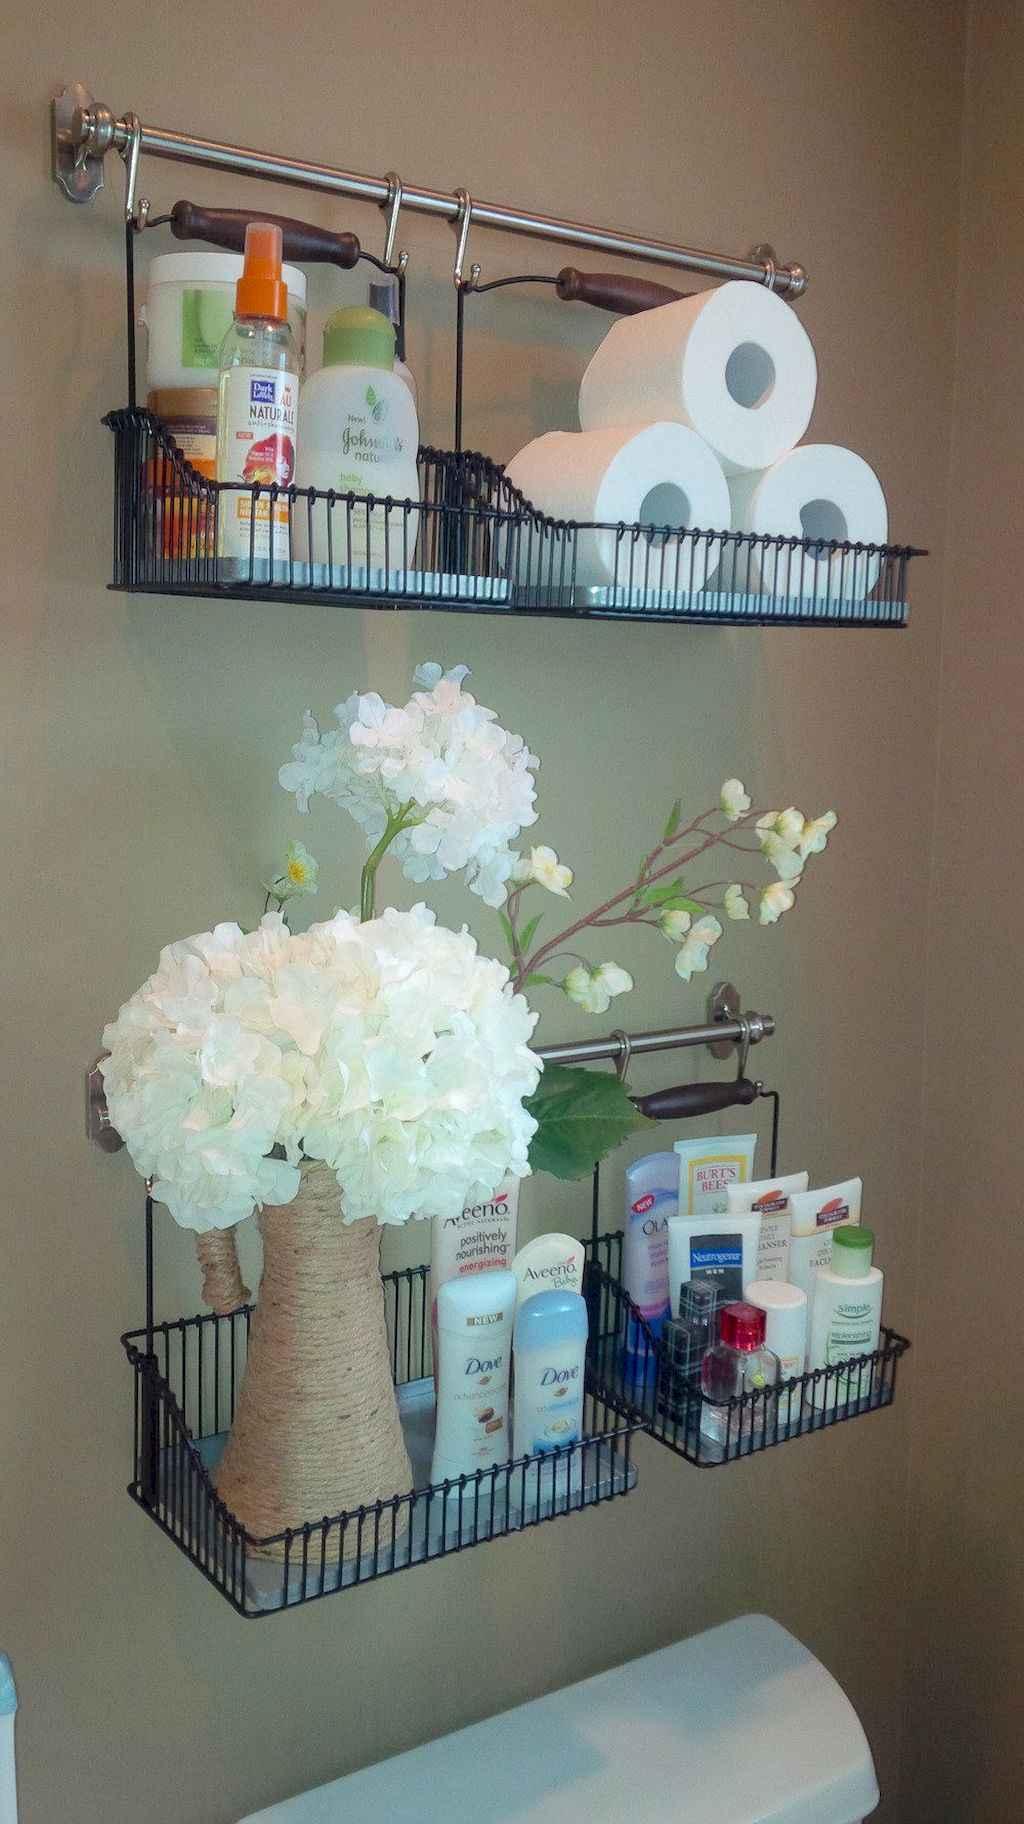 Small apartment decorating ideas (24)